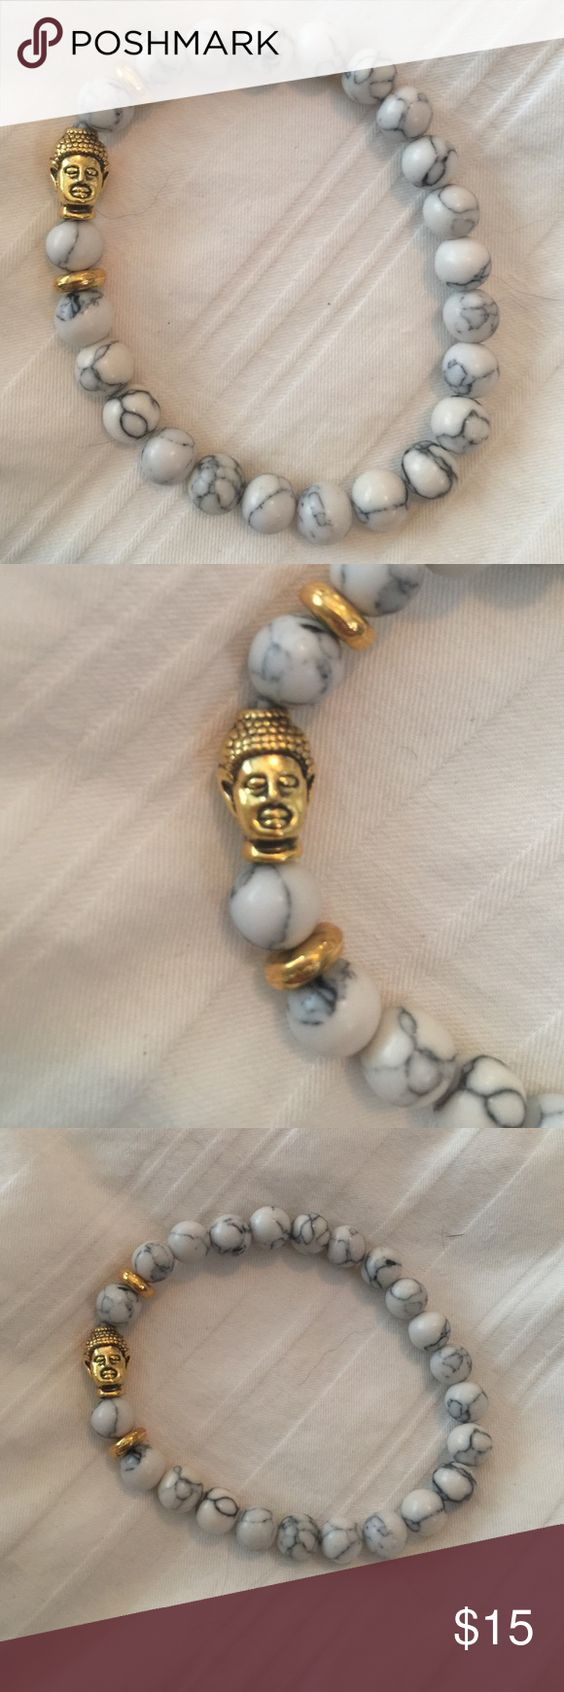 White marble beaded buddha bracelet Beautiful white marble stone beads and gold buddha charm bead Jewelry Bracelets